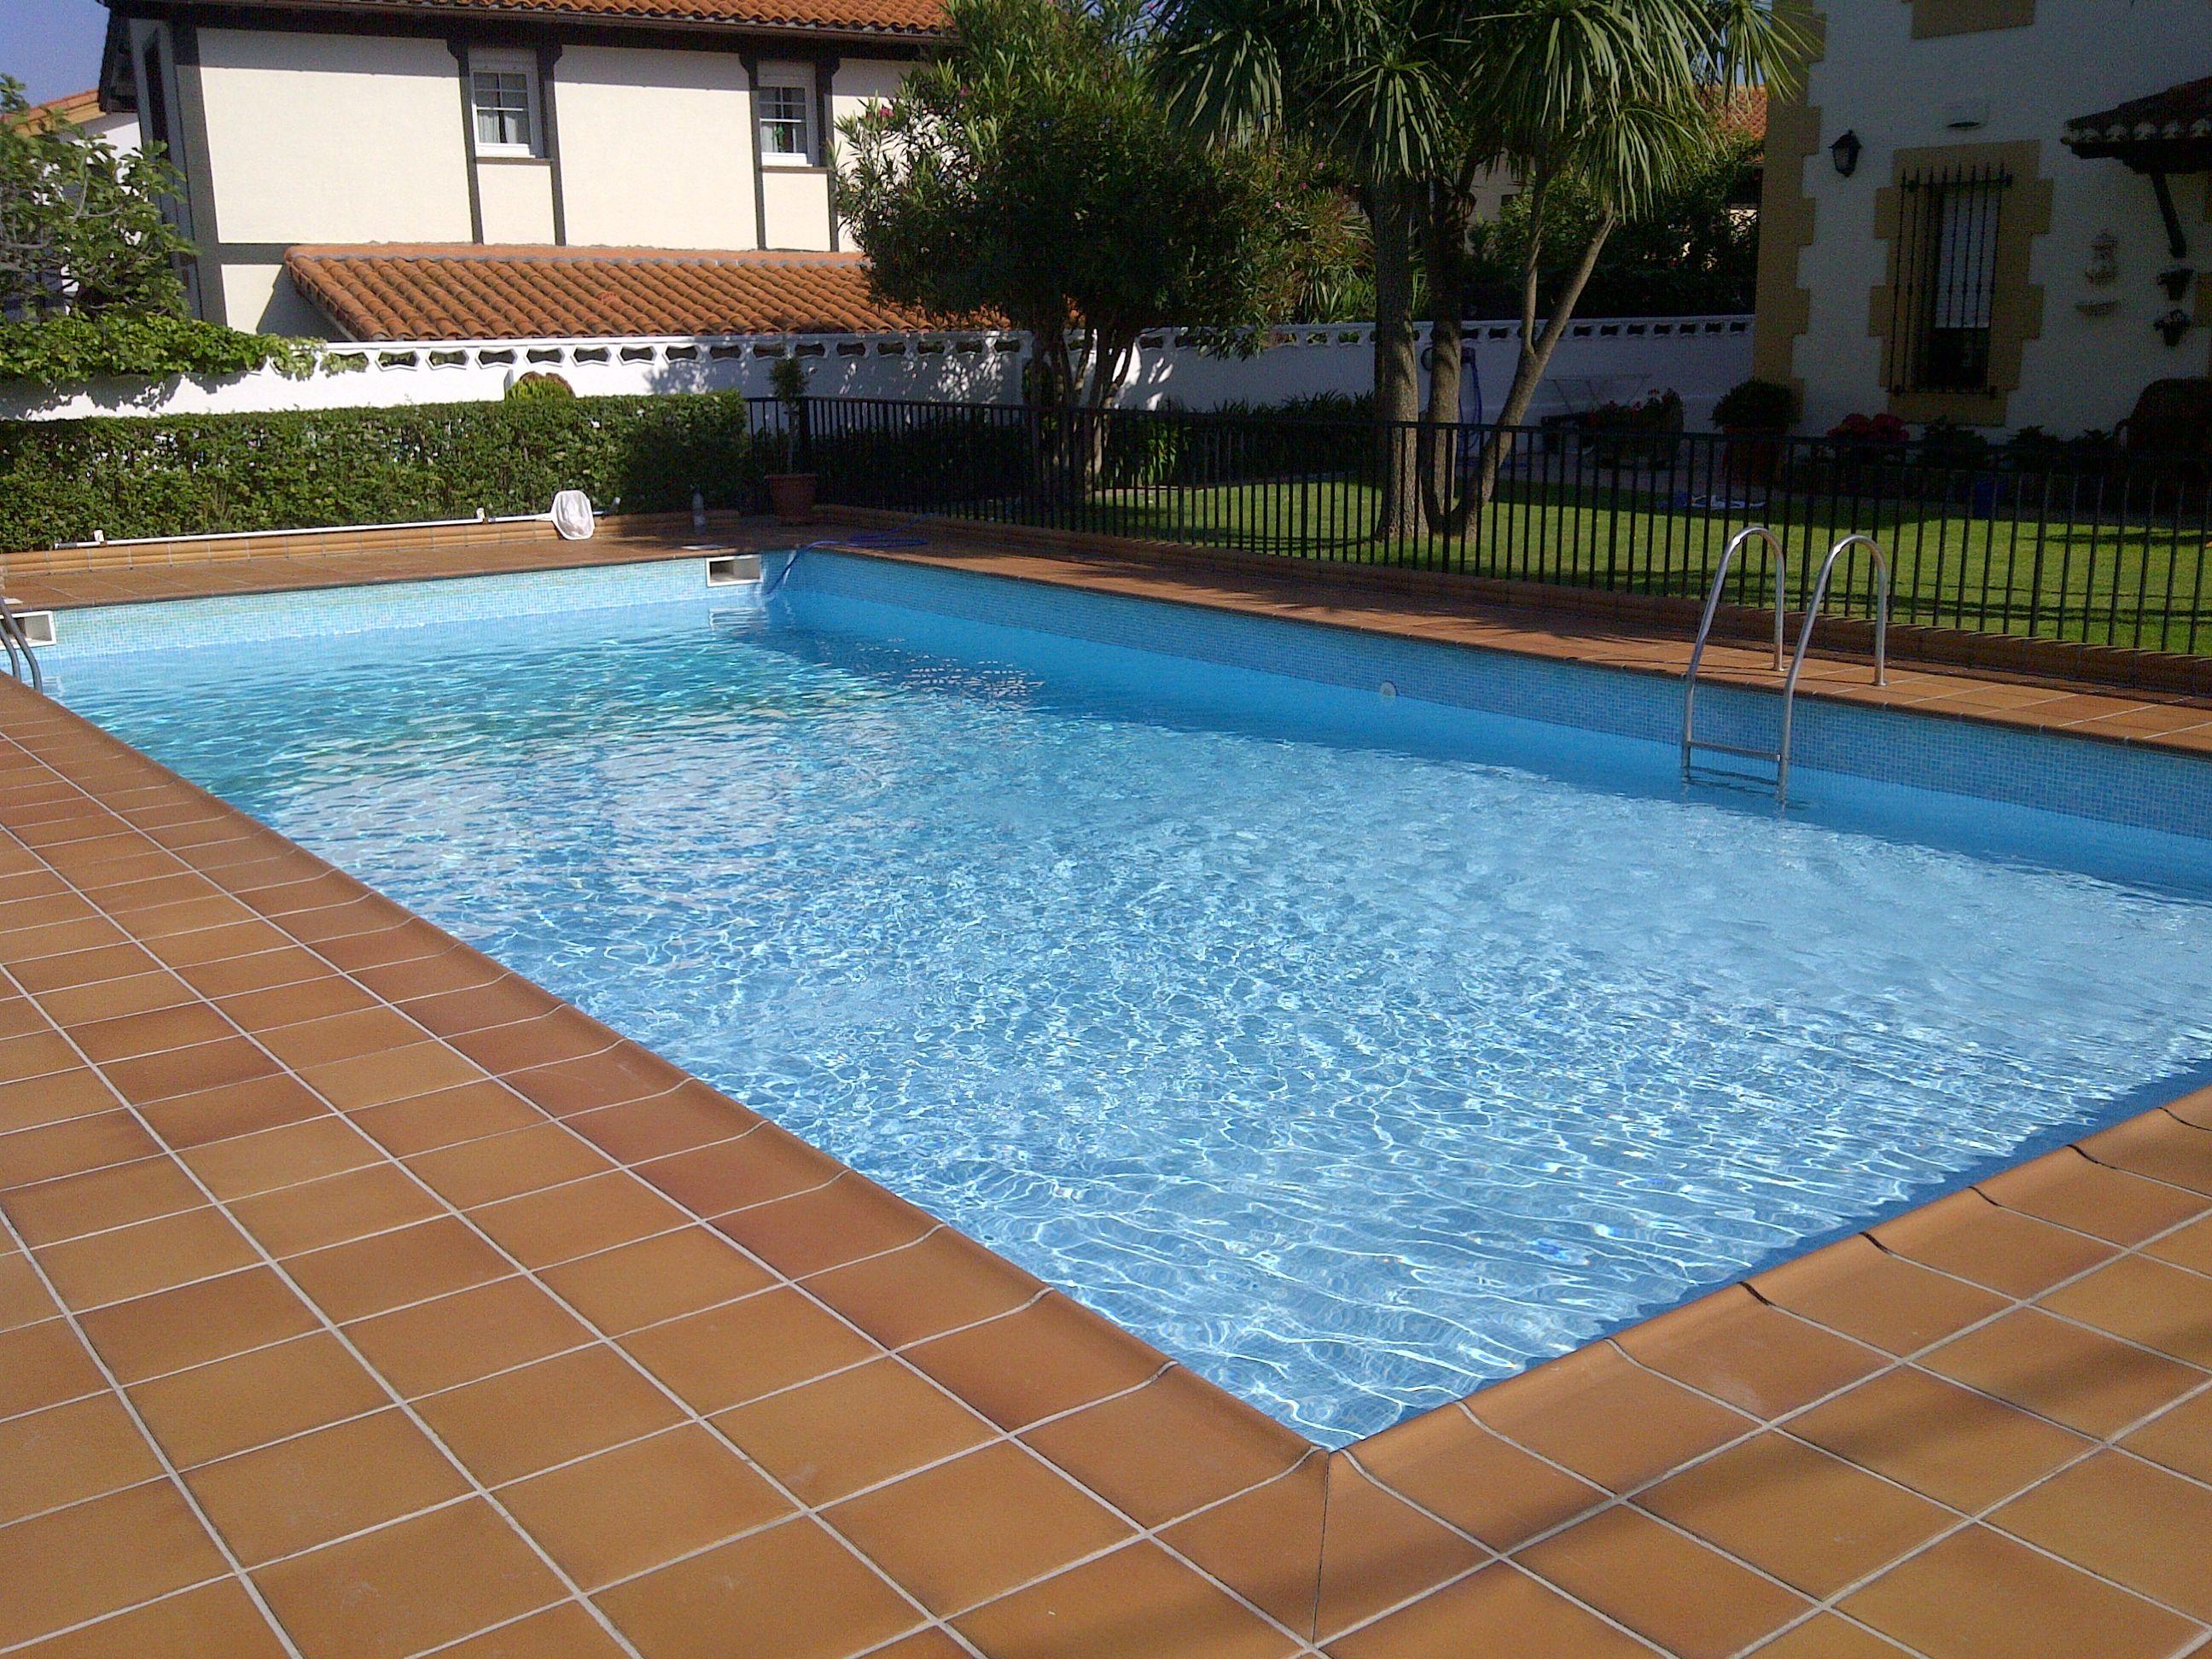 Piscinas de hormigon construccin piscinas hormign armado for Ofertas piscinas de hormigon